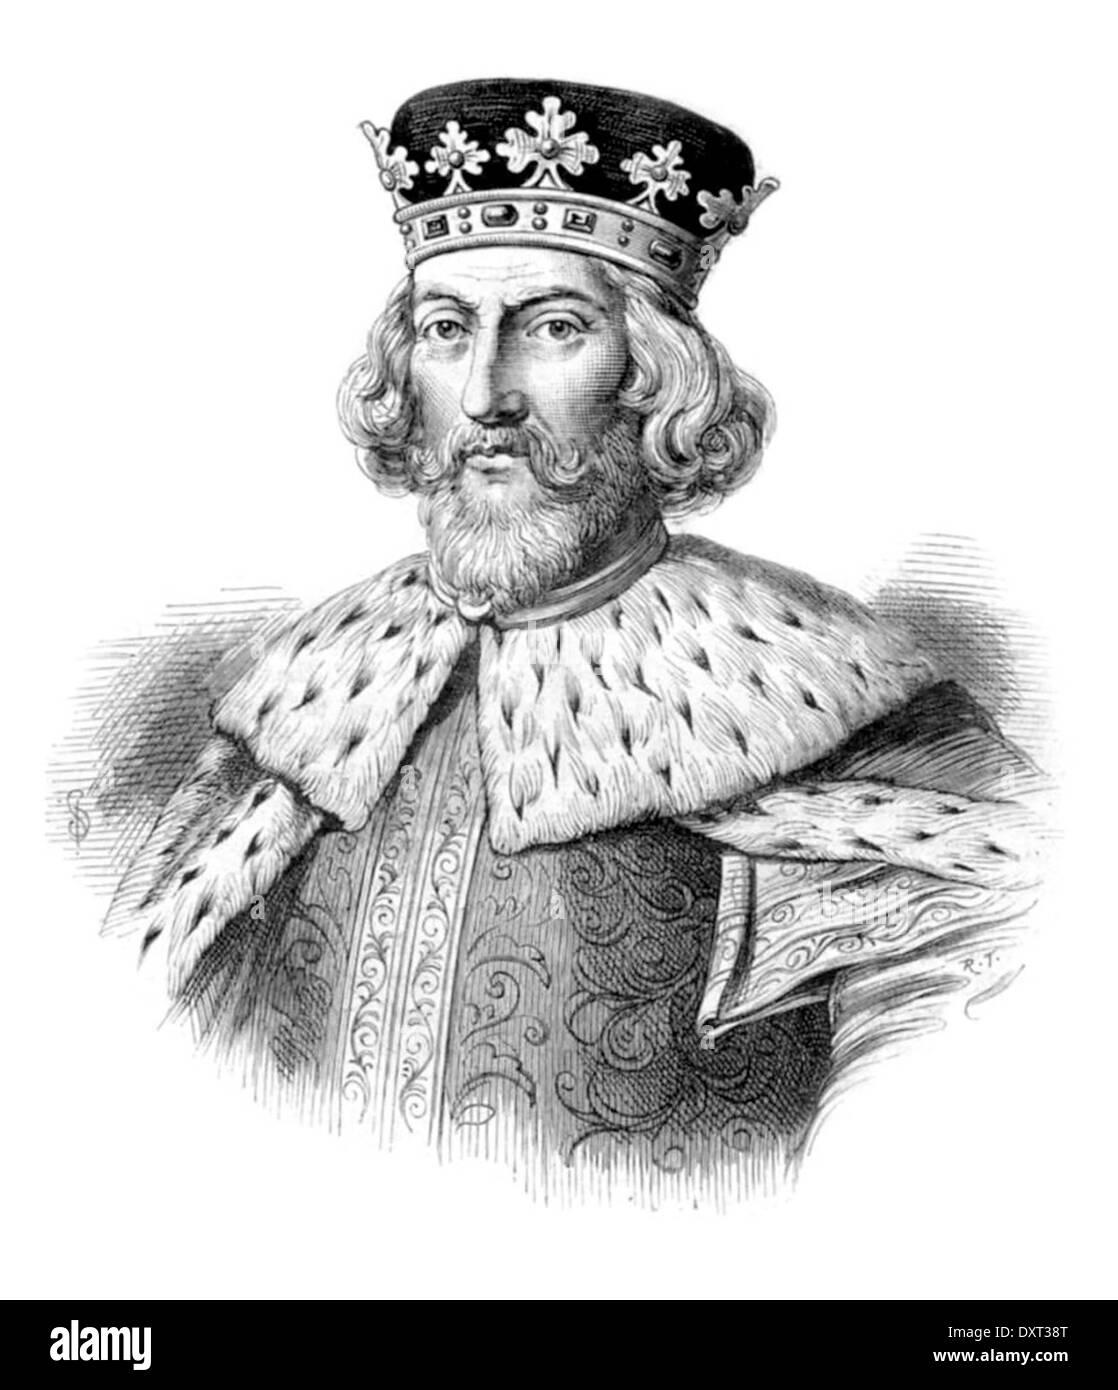 King John of England - Stock Image